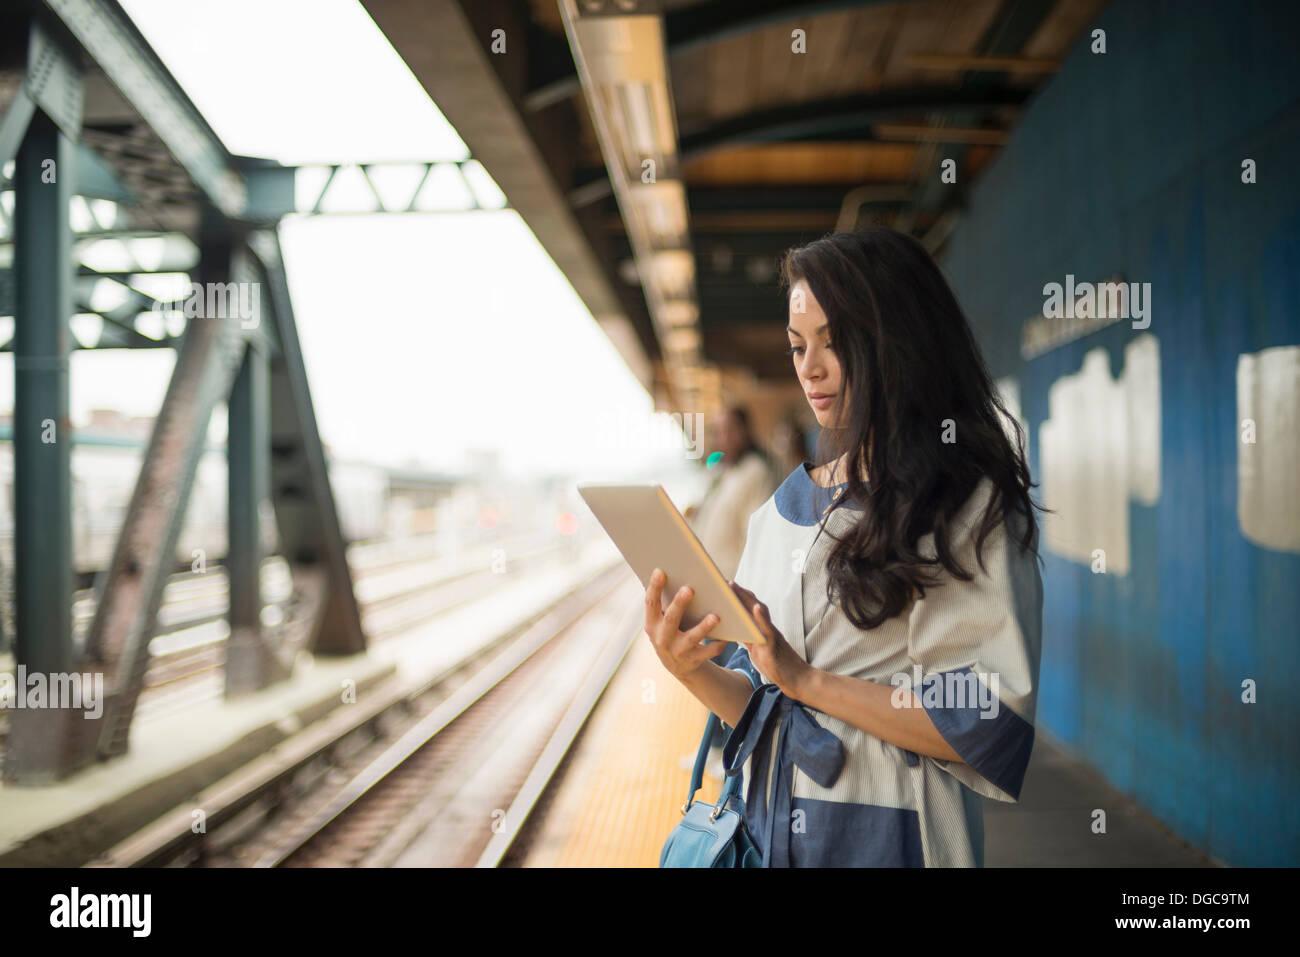 Woman using digital tablet sur plate-forme du métro, Brooklyn, New York Photo Stock